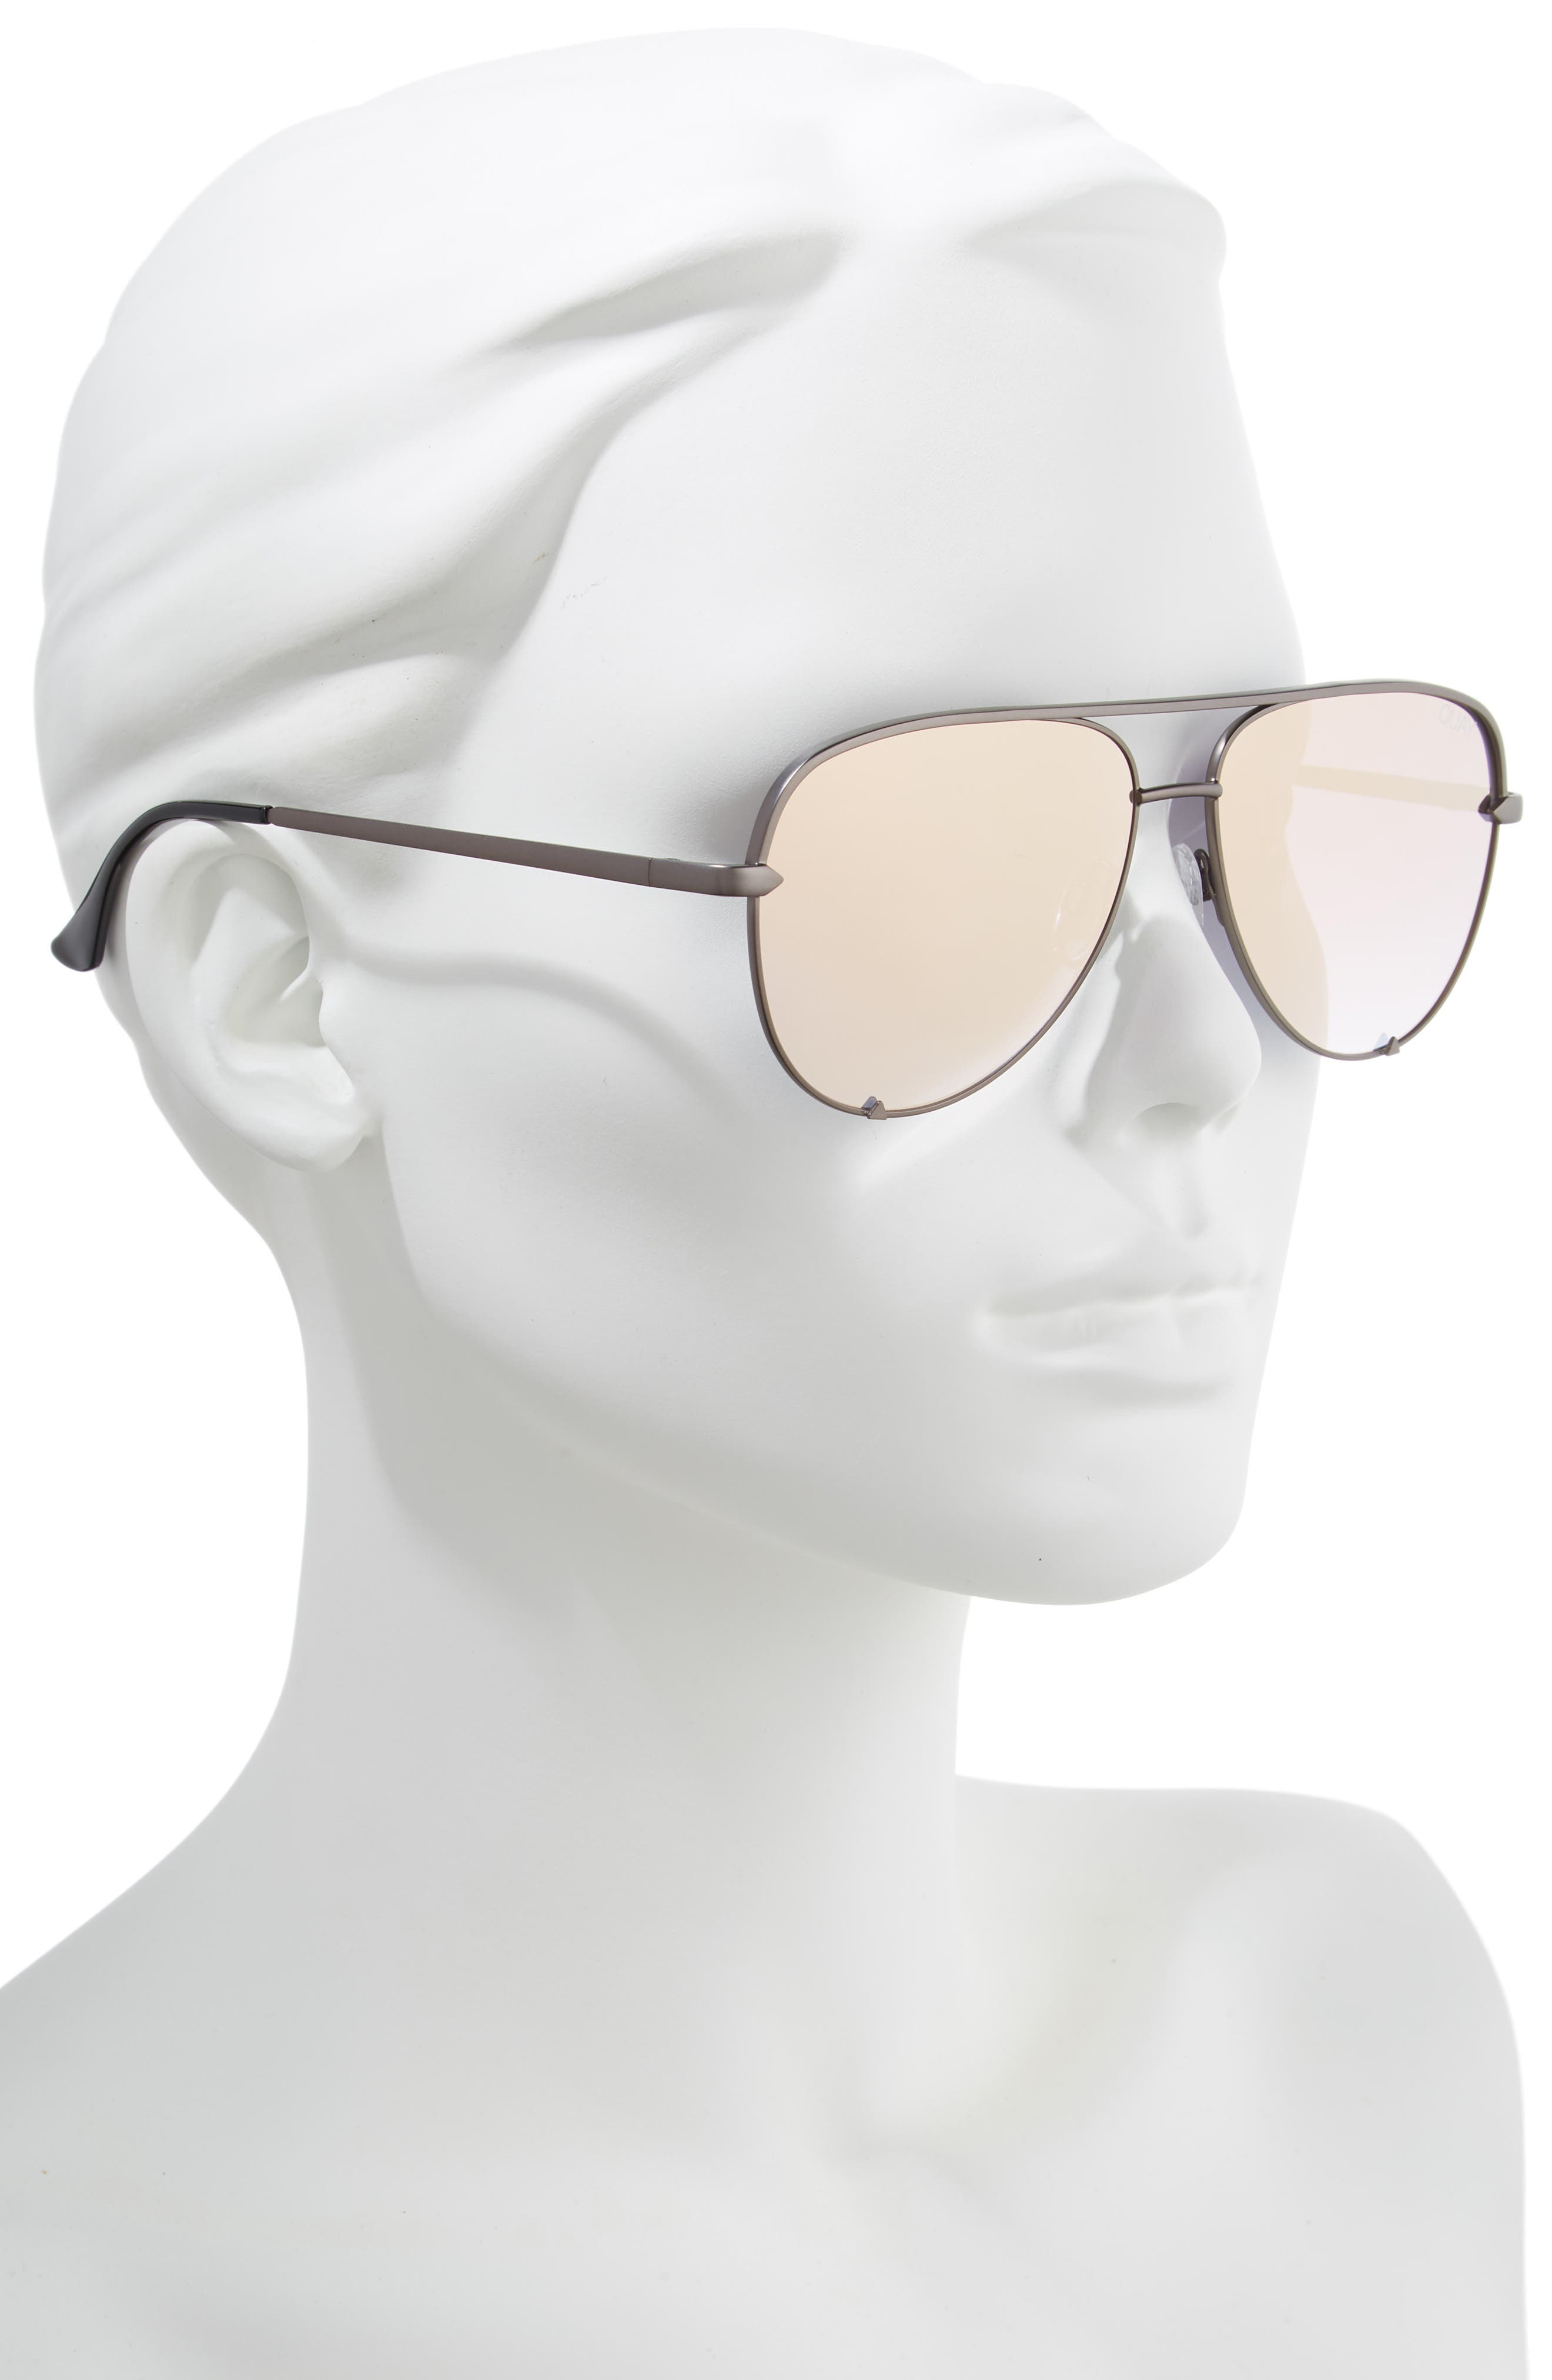 x Desi Perkins High Key Mini 57mm Aviator Sunglasses,                             Alternate thumbnail 2, color,                             GUNMETAL/ ROSE